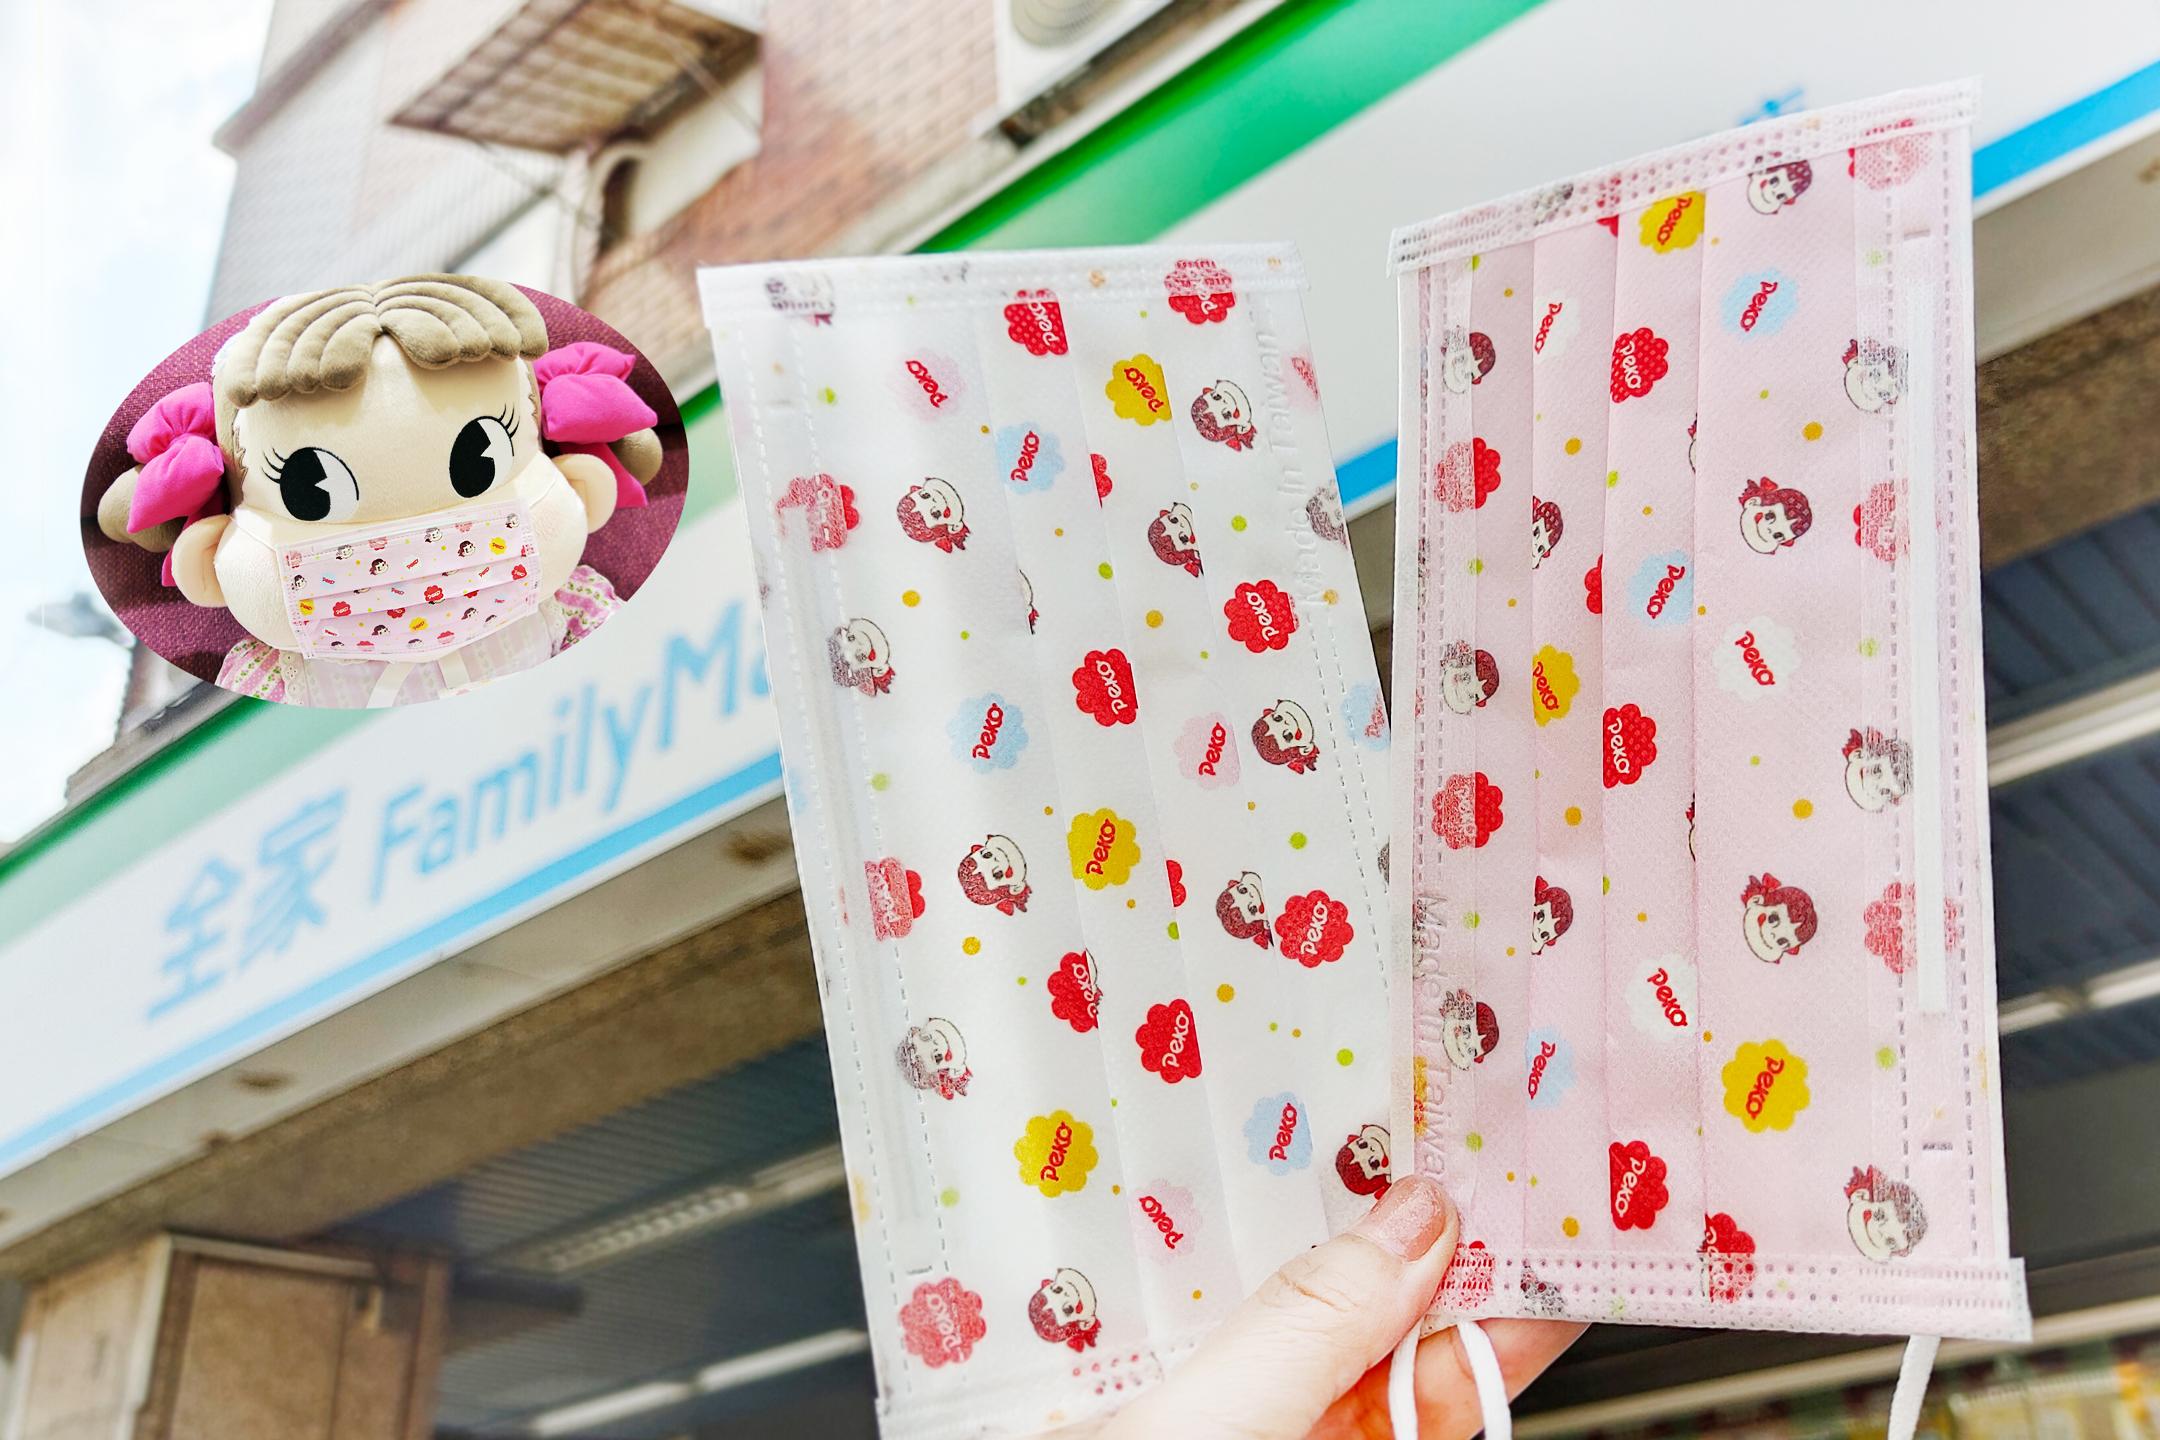 喔耶 ! 台灣終於有PEKO醬口罩了 !|到全家買不二家巧克力把PEKO醬限量口罩「戴」回家|台湾限定💛ペコちゃんマスク可愛い!|2021年9月活動贈品(雜貨小物系列33)